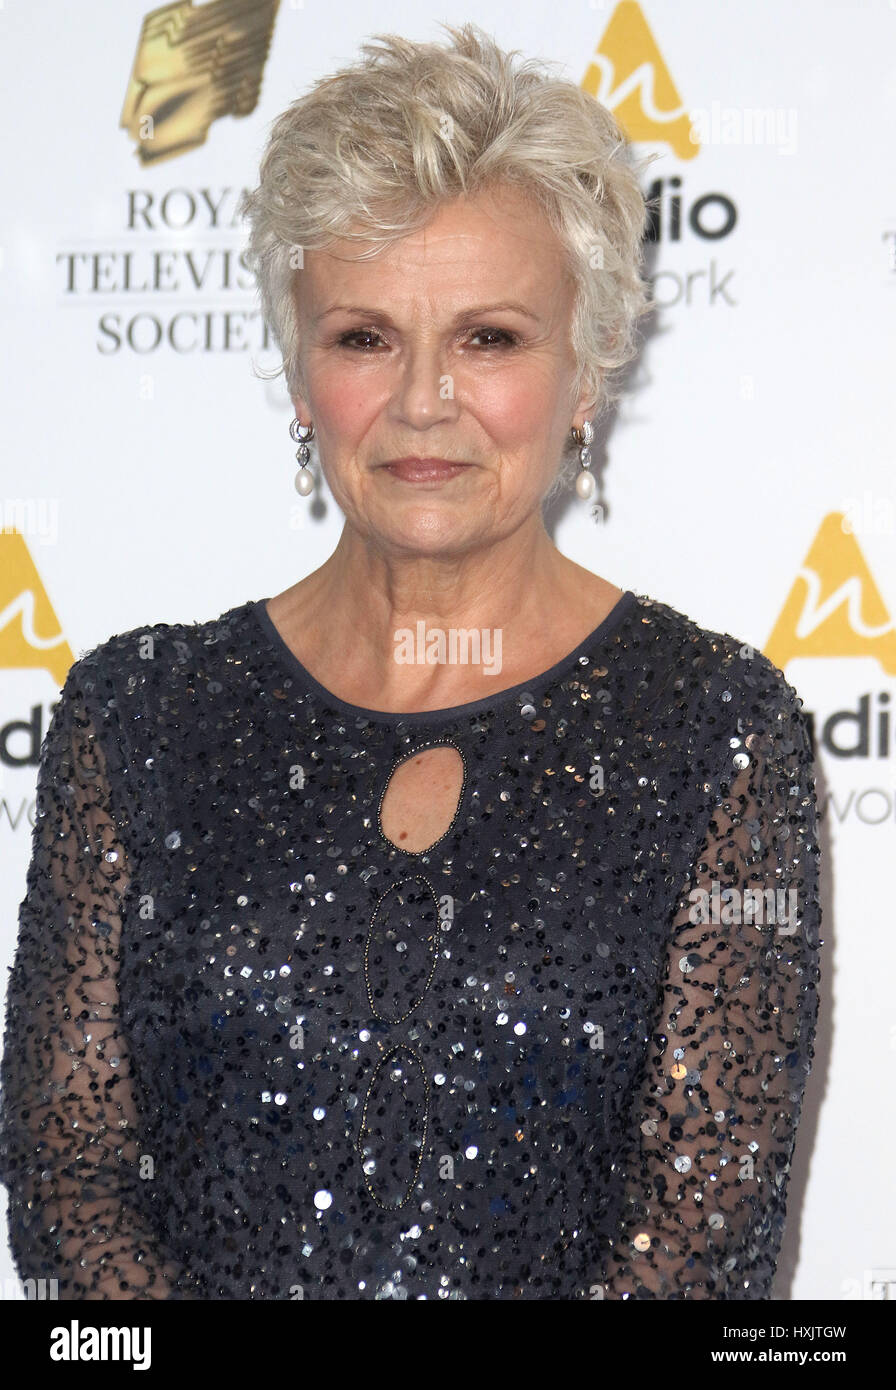 Mar 21, 2017 - Julie Walters frequentando Royal televisione società Awards 2017, Grosvenor House Hotel in London, Immagini Stock